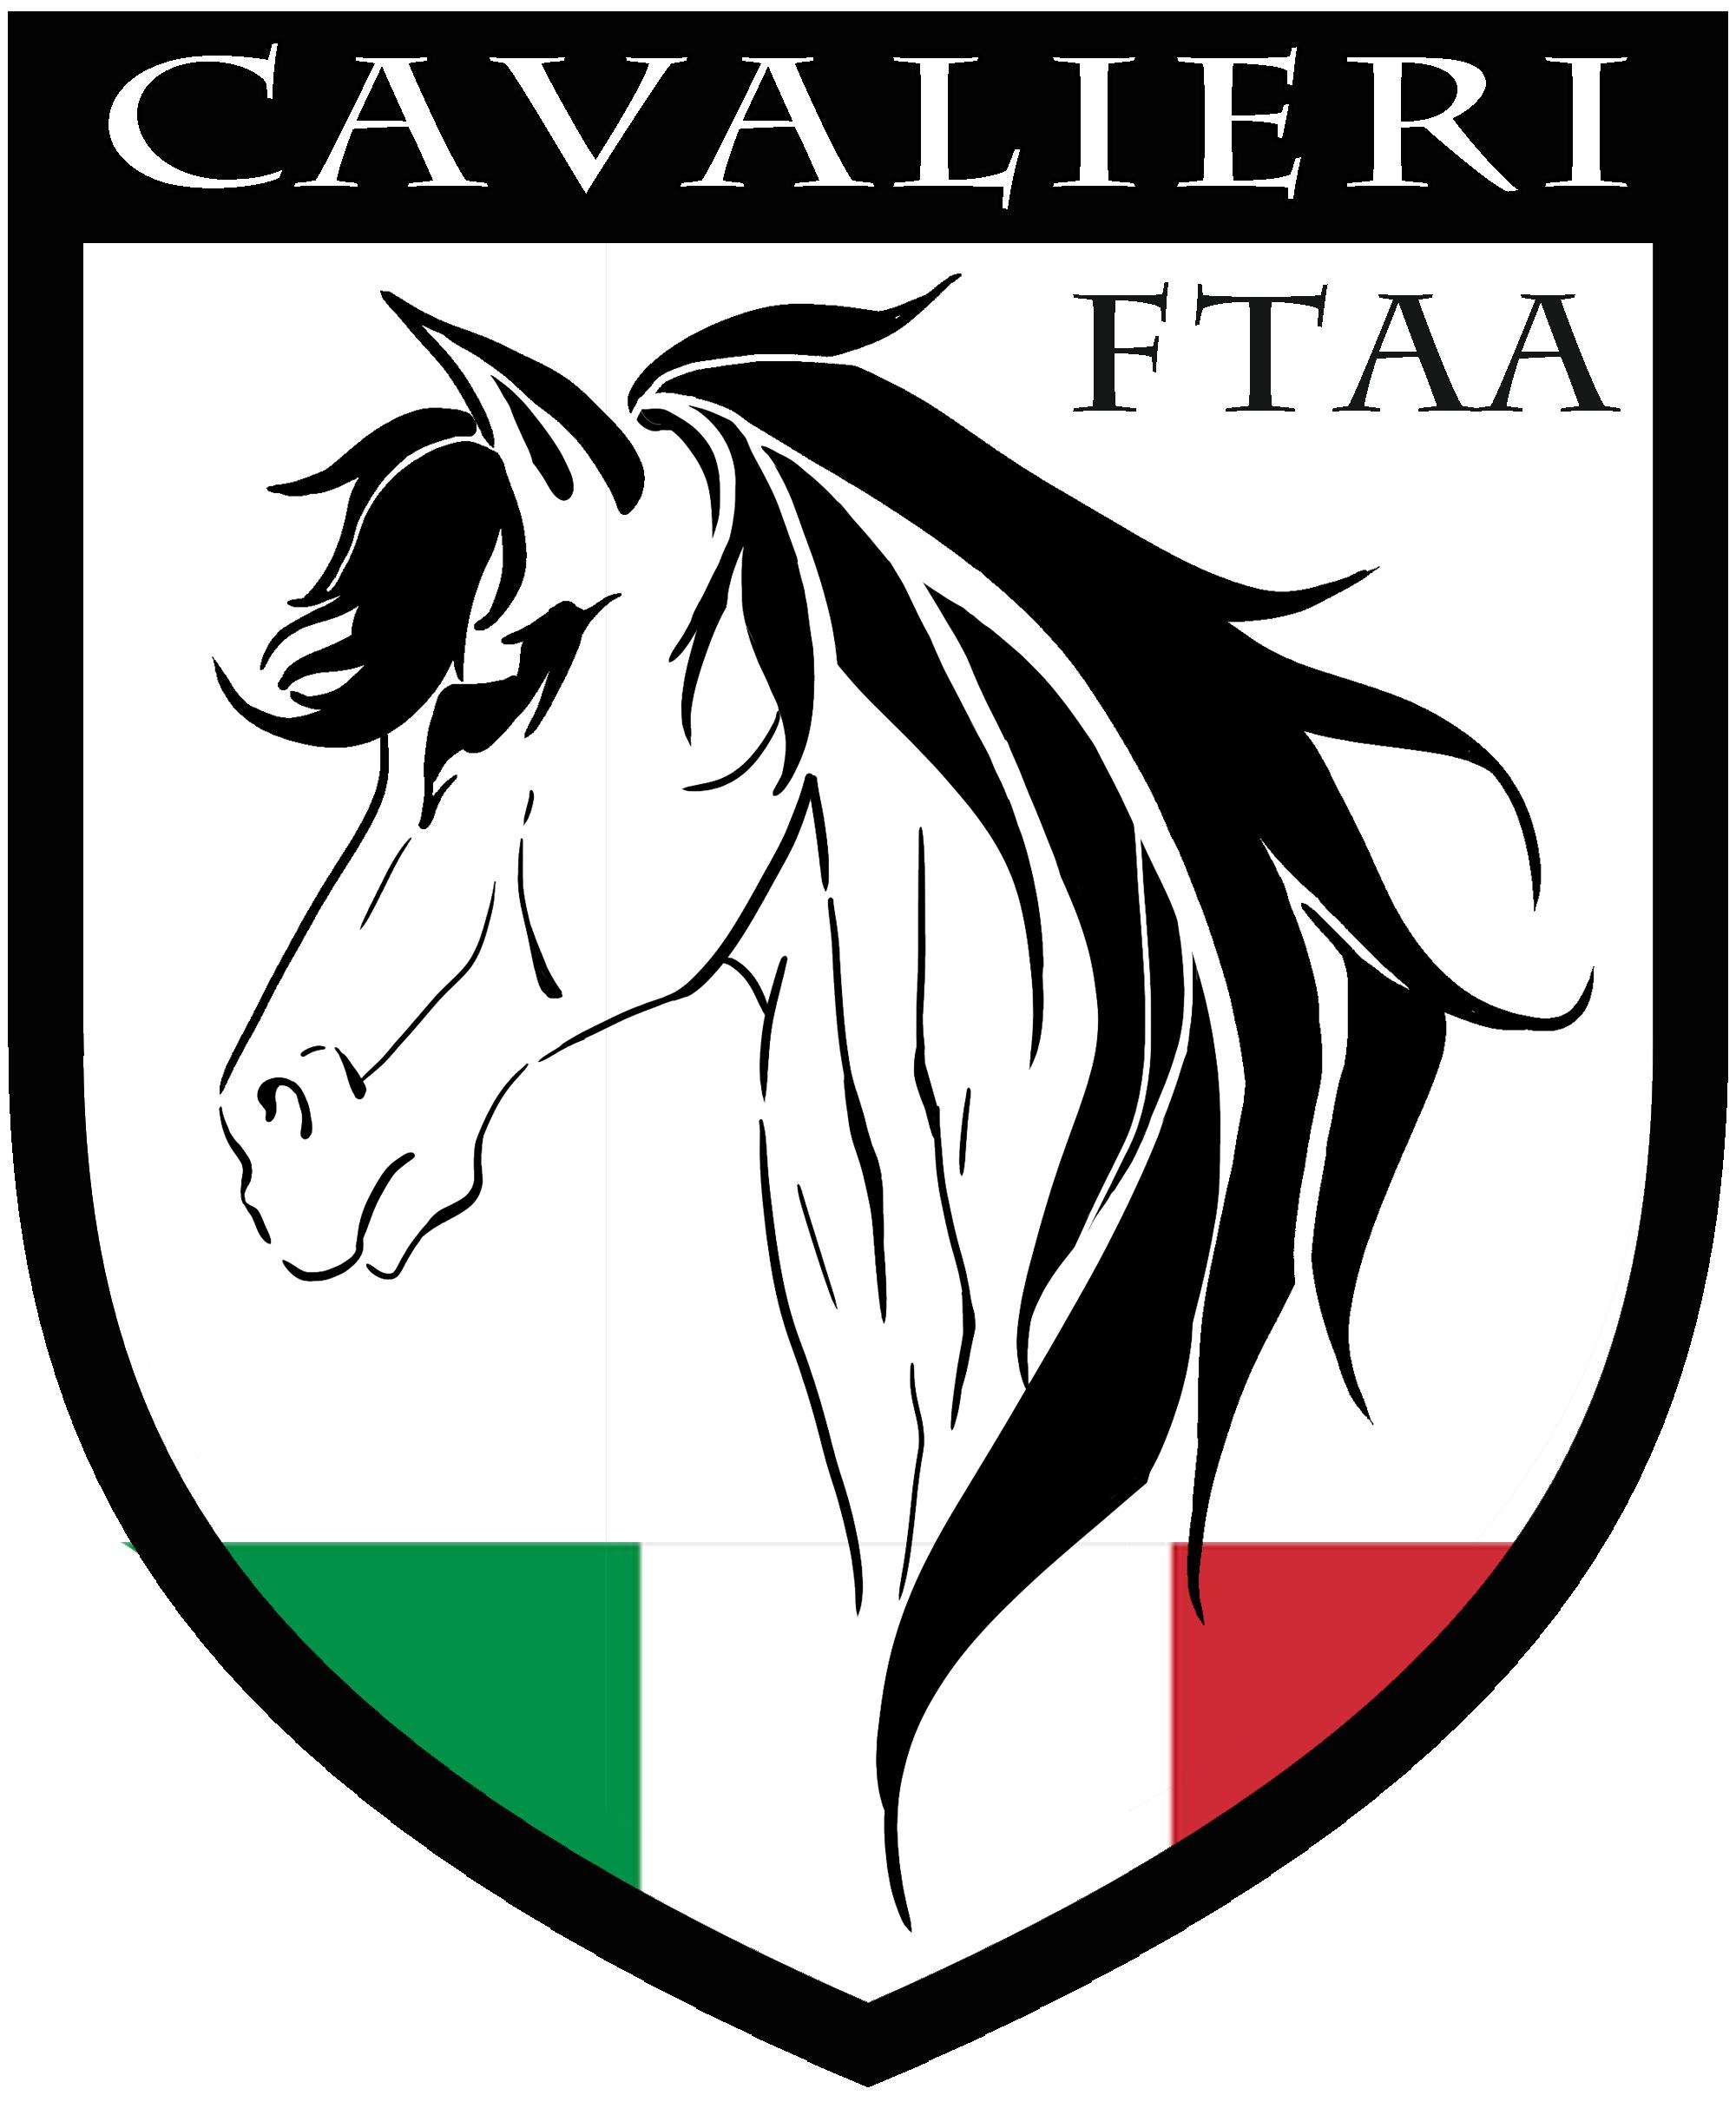 Cavalieri FTAA